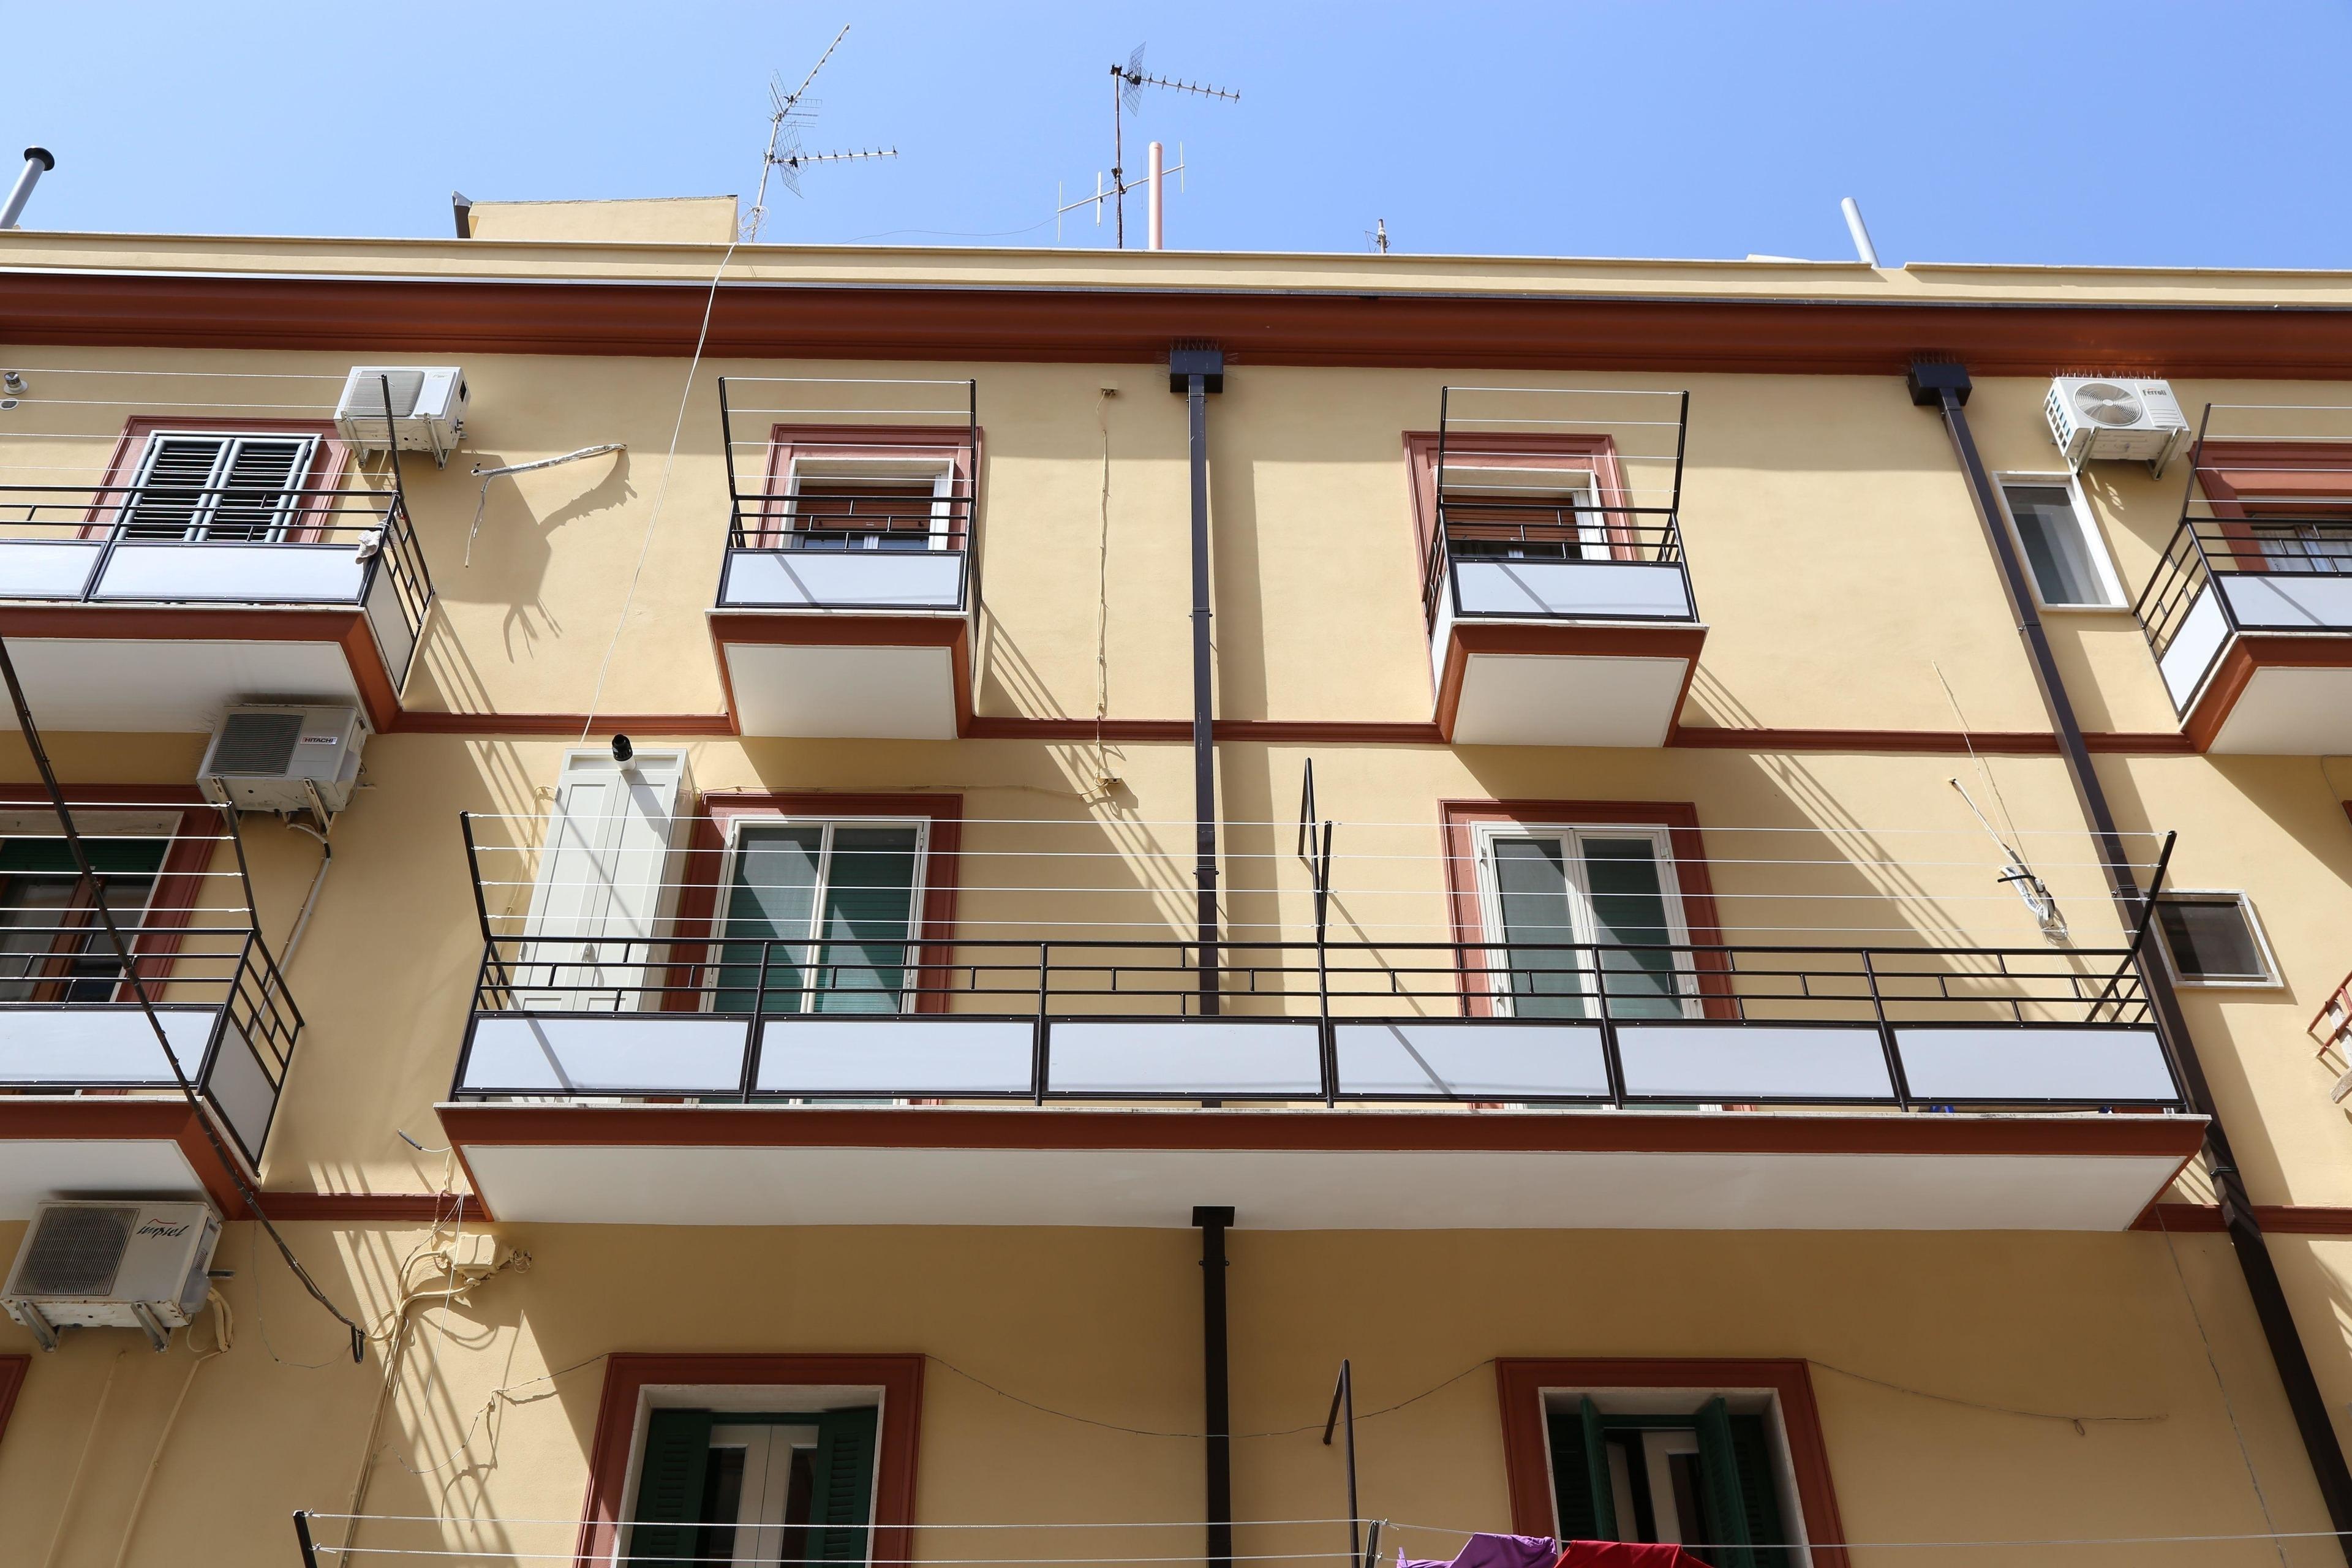 Ferienhaus LA CASA DEI PARGOLI (2516888), Matera, Matera, Basilikata, Italien, Bild 21